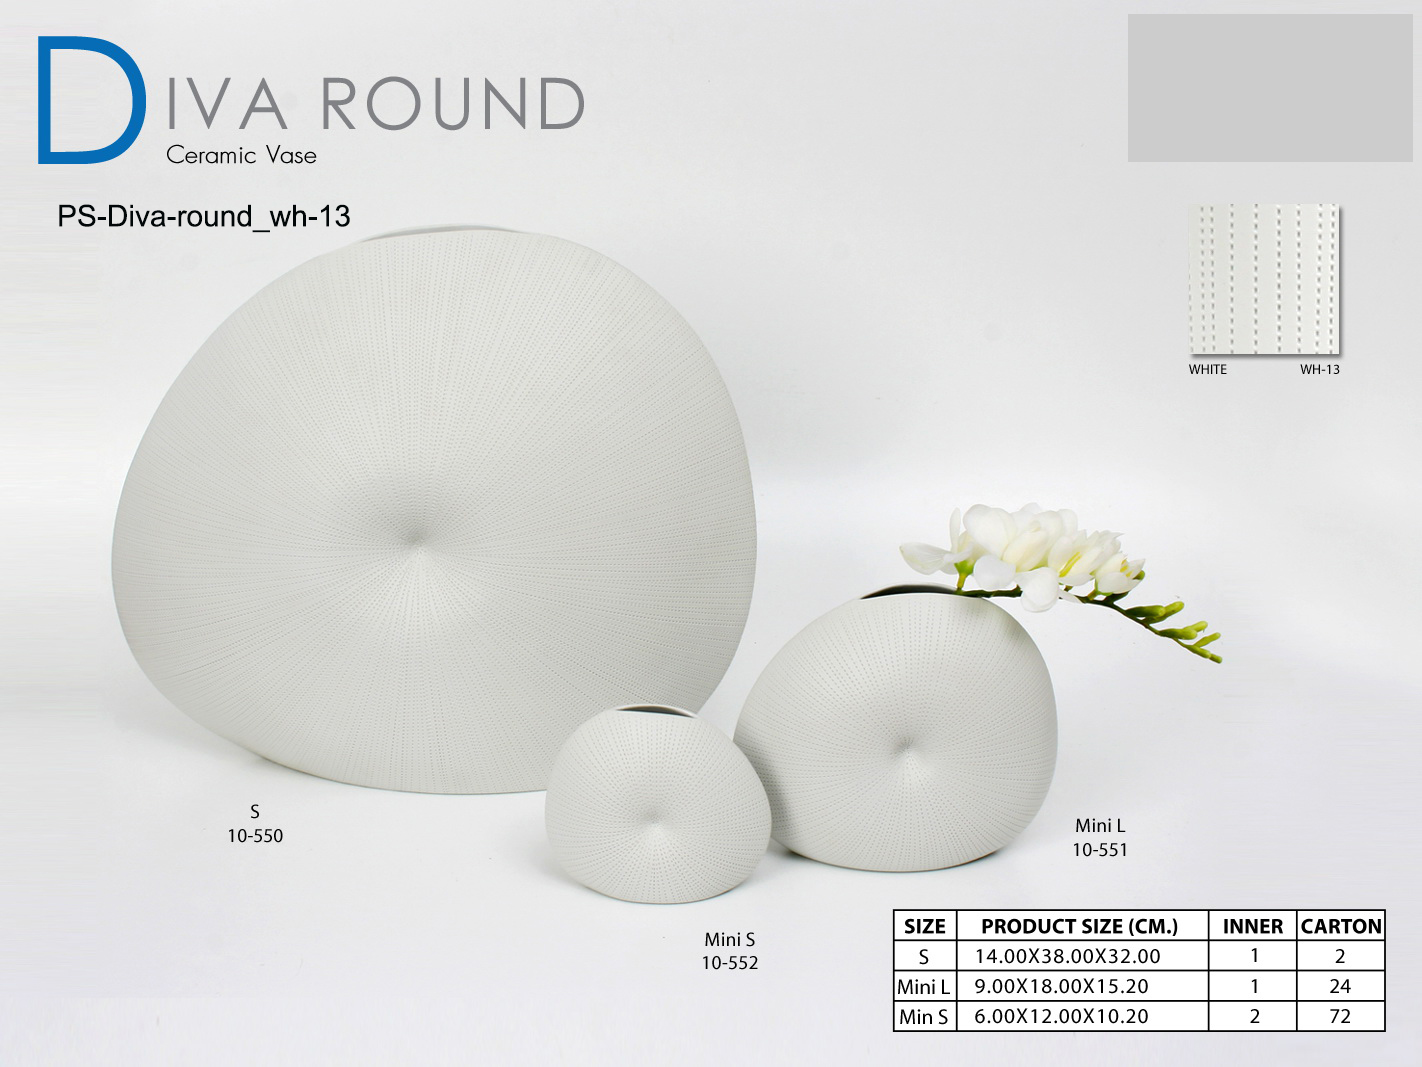 PSCV-Diva-round_wh-13